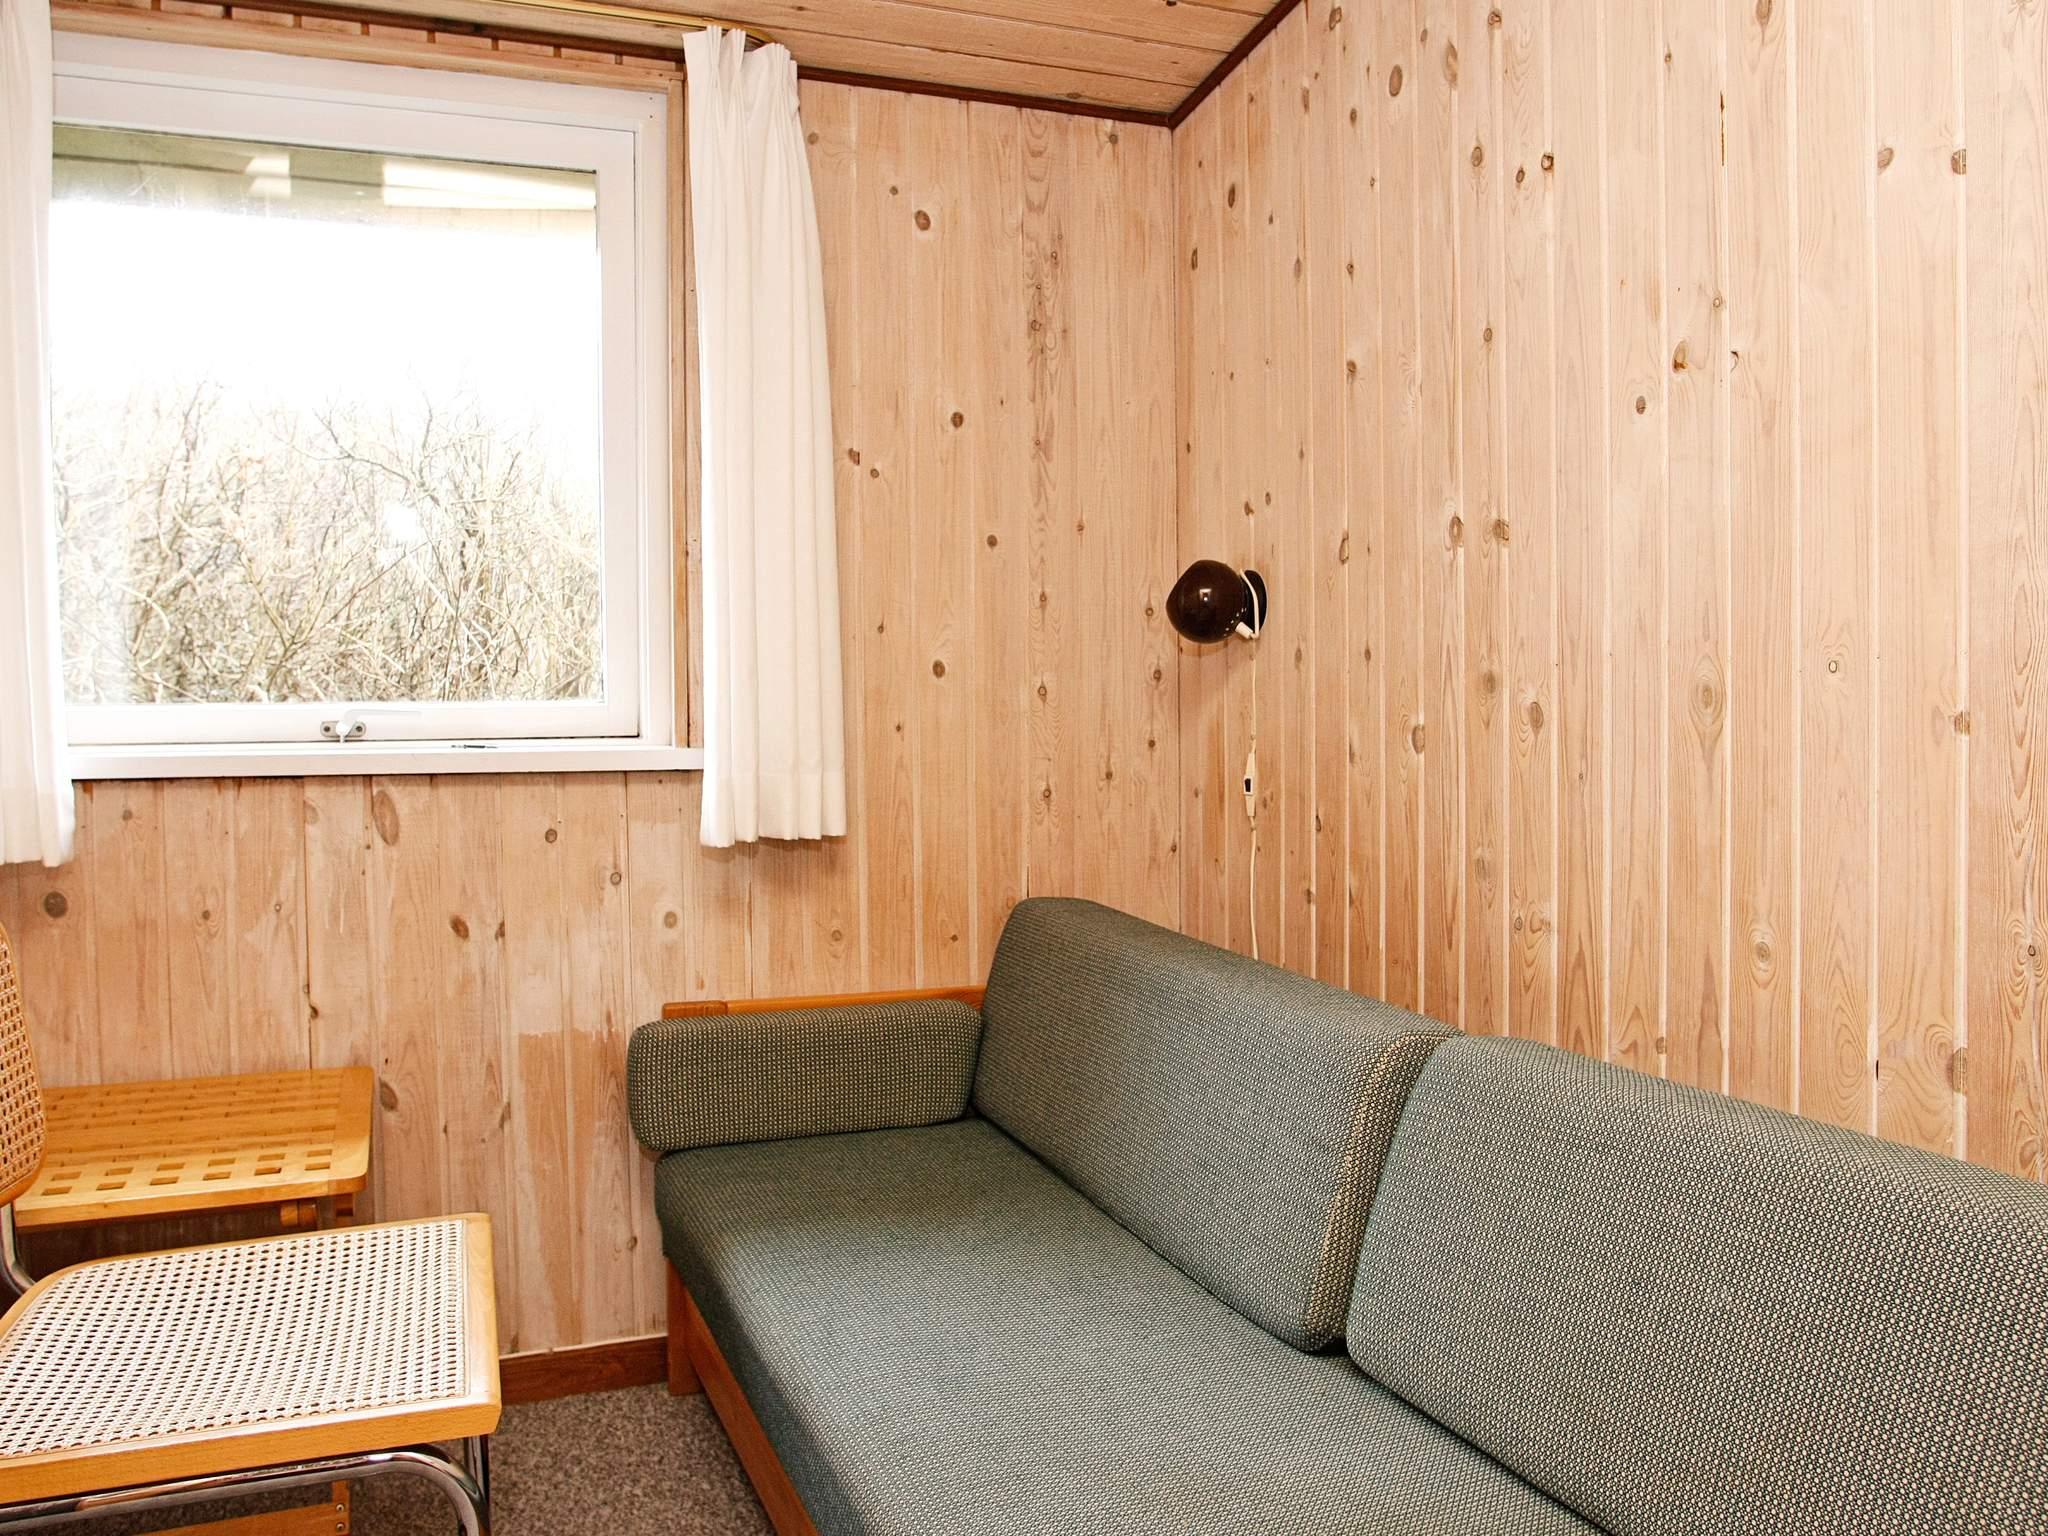 Ferienhaus Nr. Lyngby (89563), Løkken, , Nordwestjütland, Dänemark, Bild 5